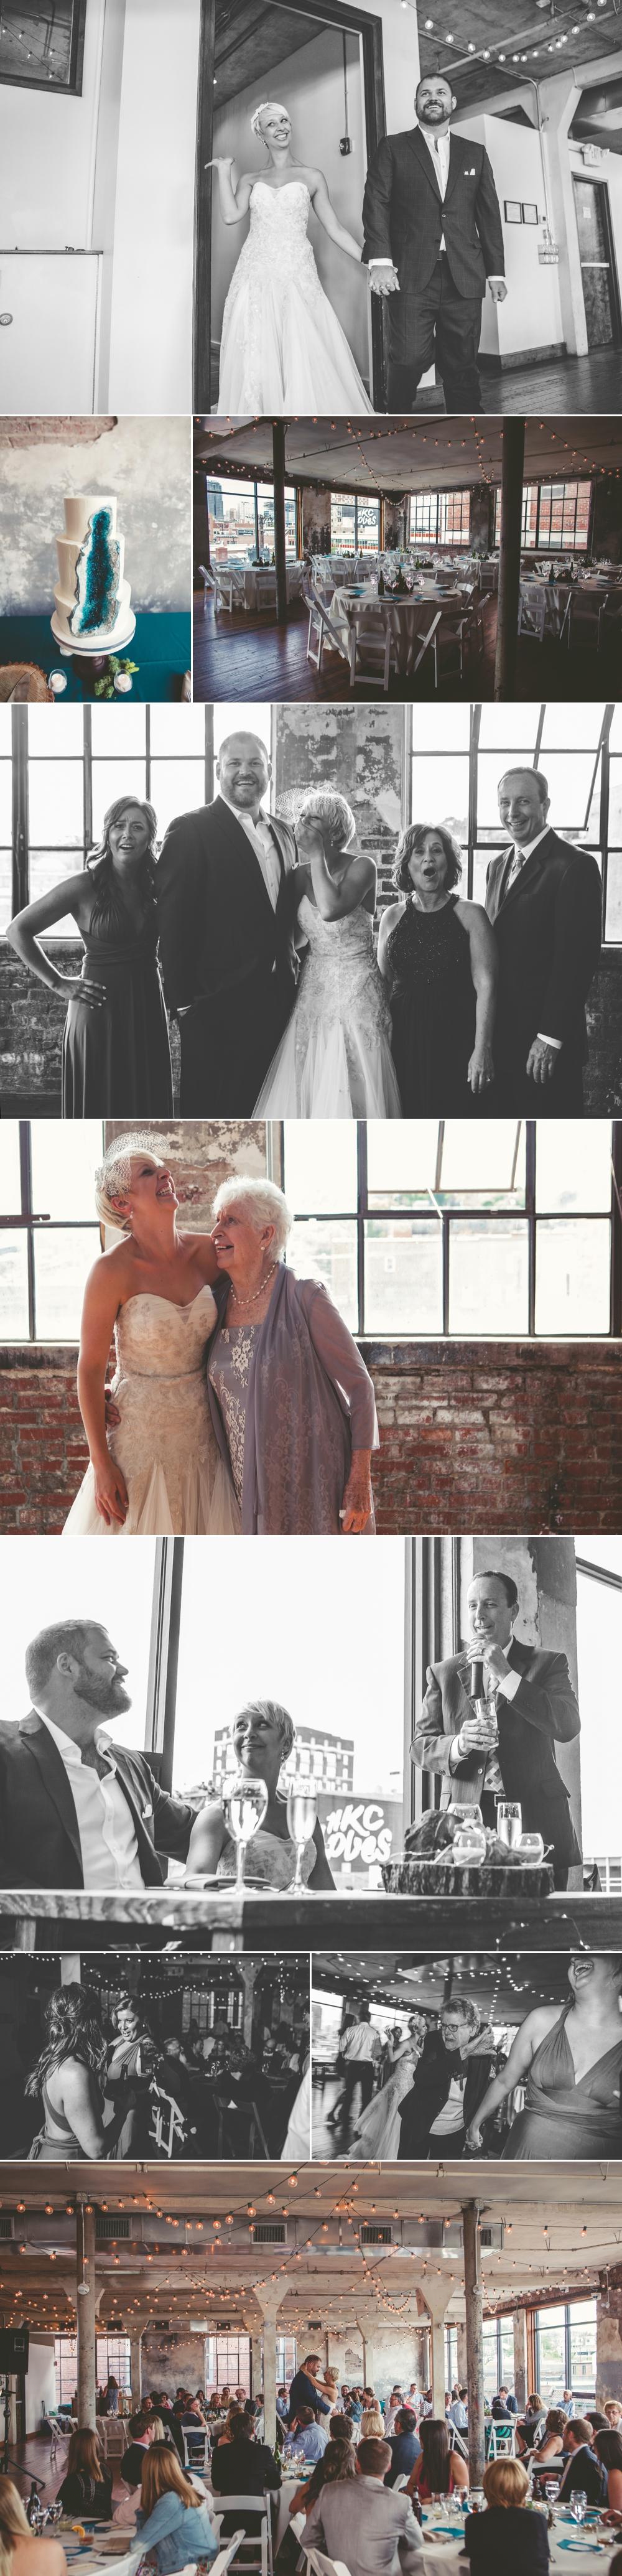 jason_domingues_photography_best_kansas_city_photographer_kc_weddings_toms_town_bauer_0003.jpg